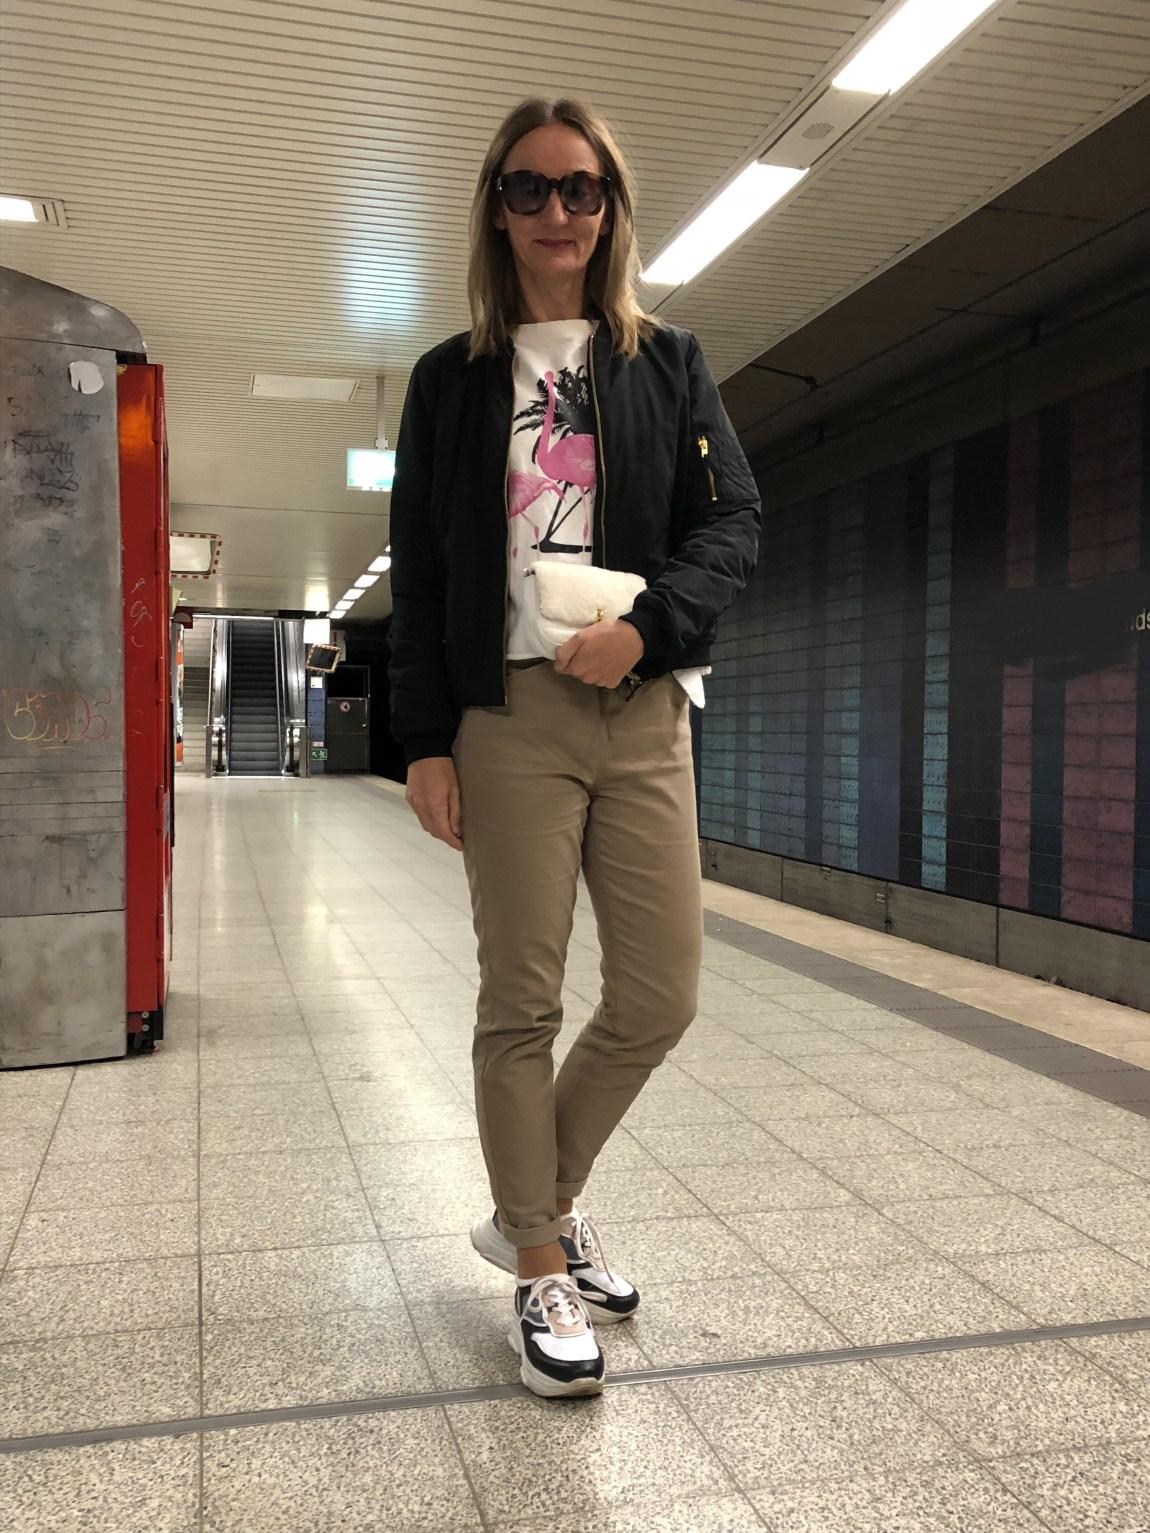 frankfurt_altstadt_blouson_bomber-jacke_casual-look_mode-blog_ue50_oceanblue-style